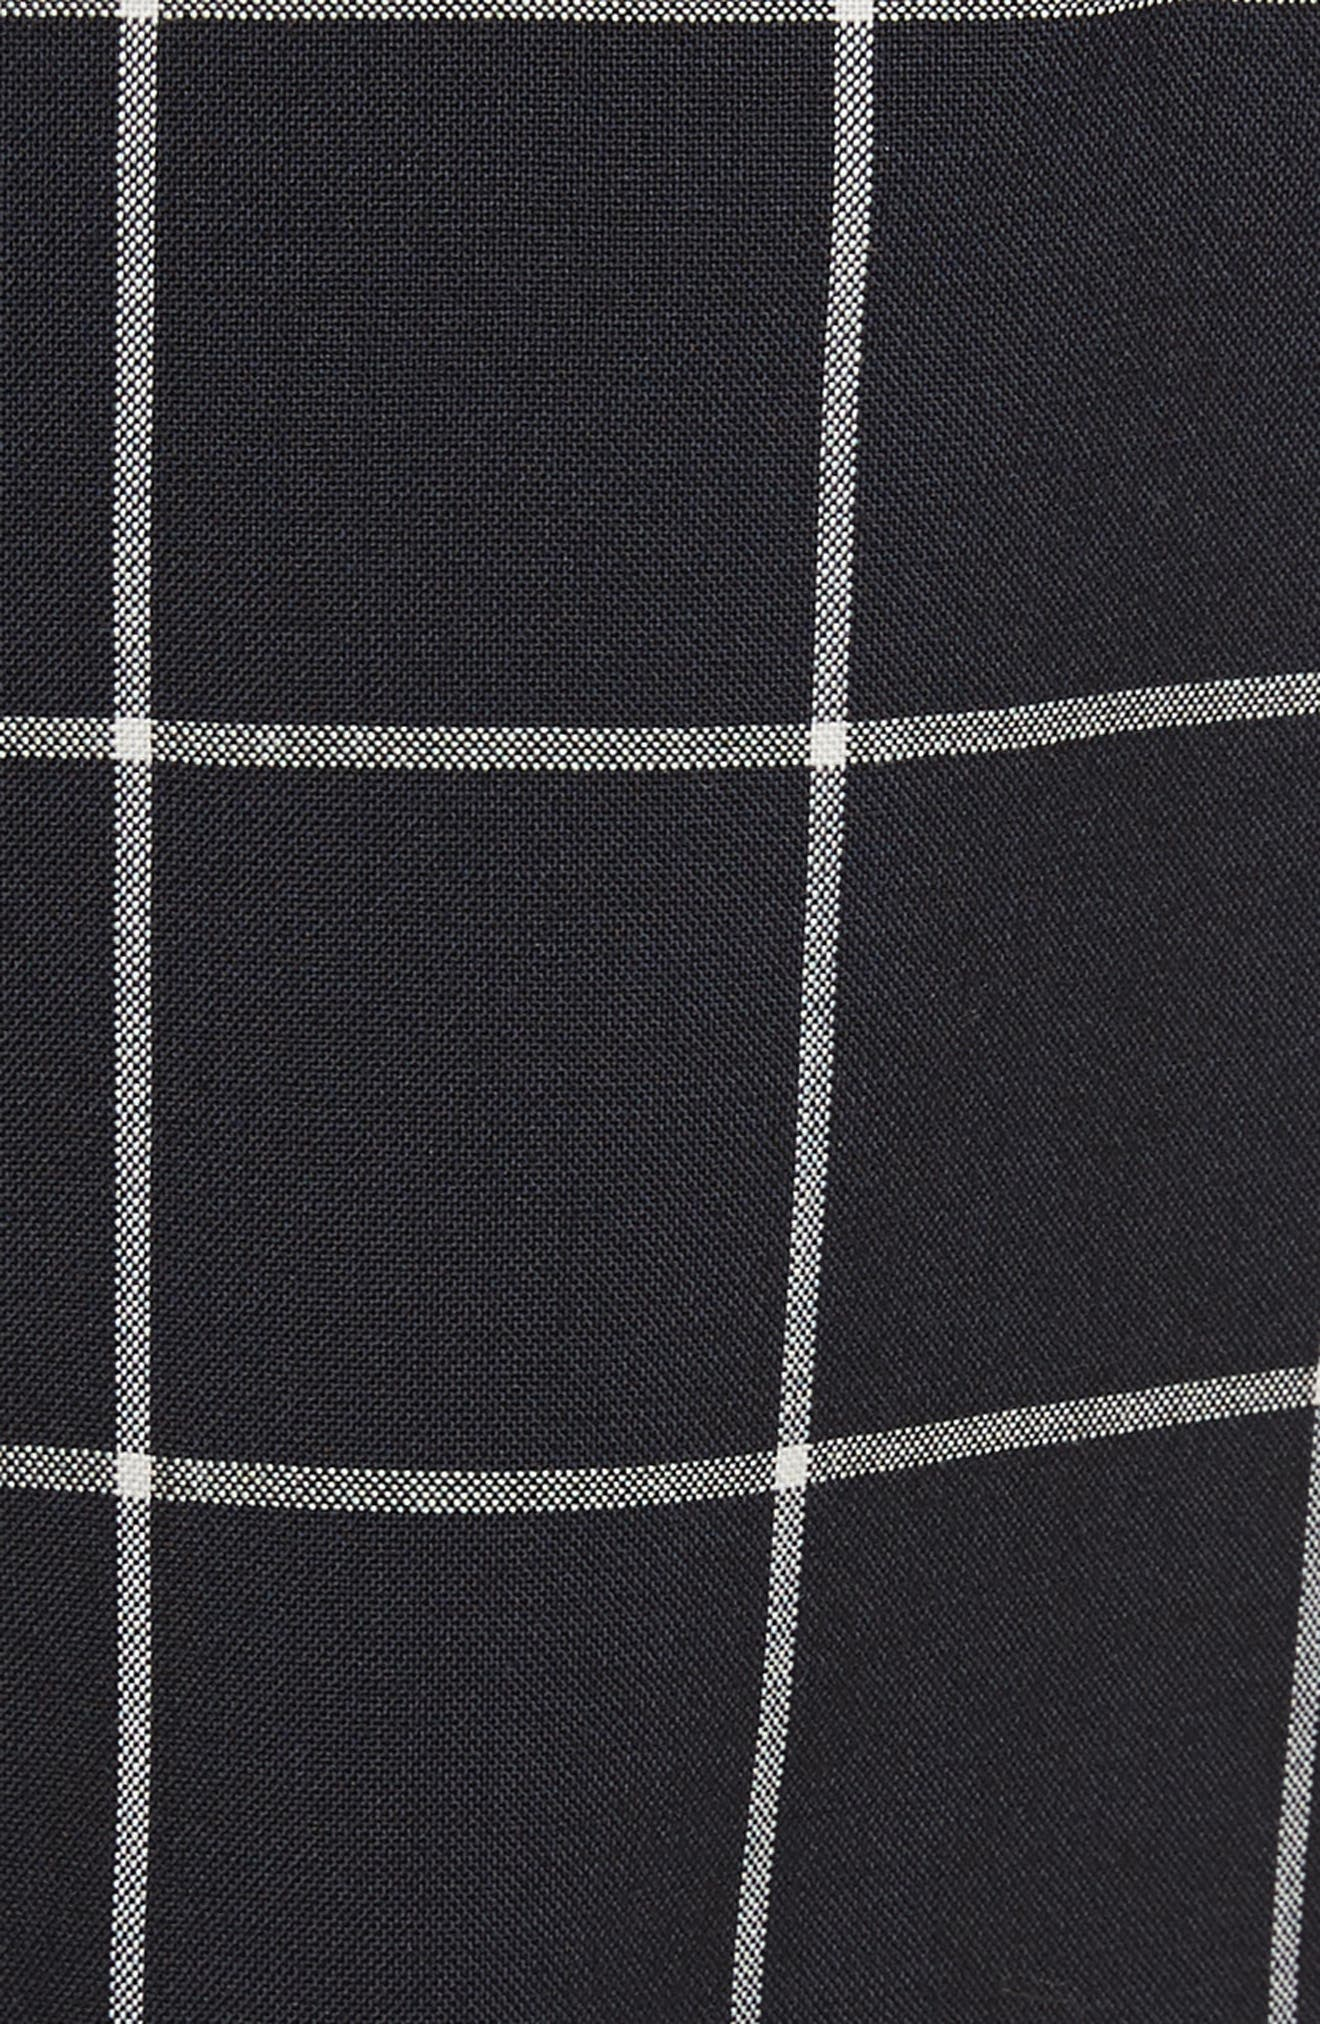 Peekaboo Windowpane Plaid Wool Shorts,                             Alternate thumbnail 5, color,                             Navy/ White